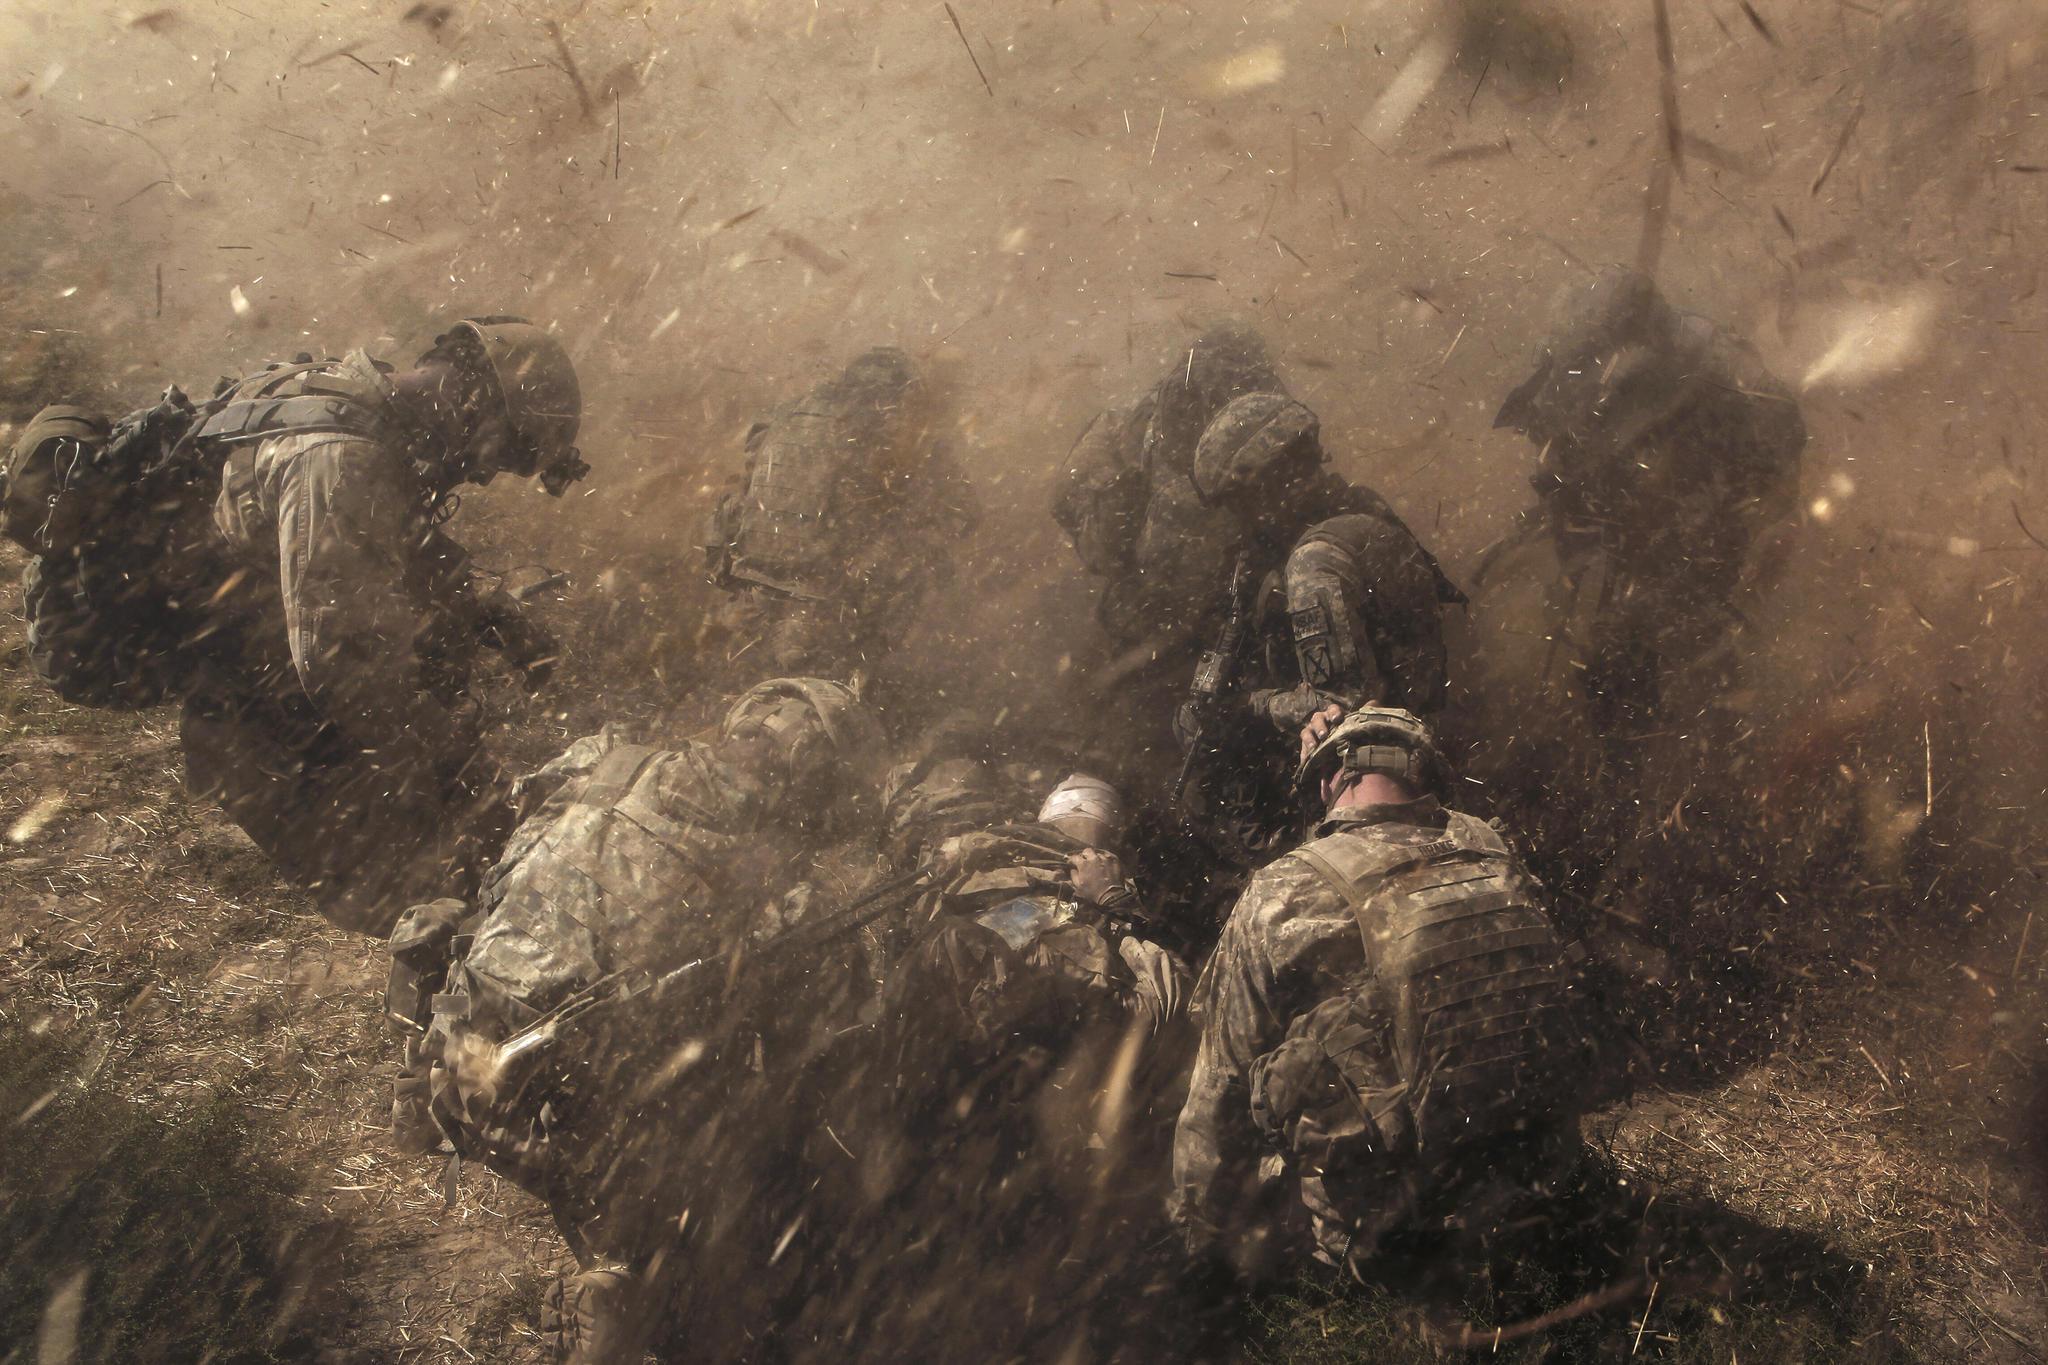 Soldados norte-americanos da infantaria atendem colega ferido